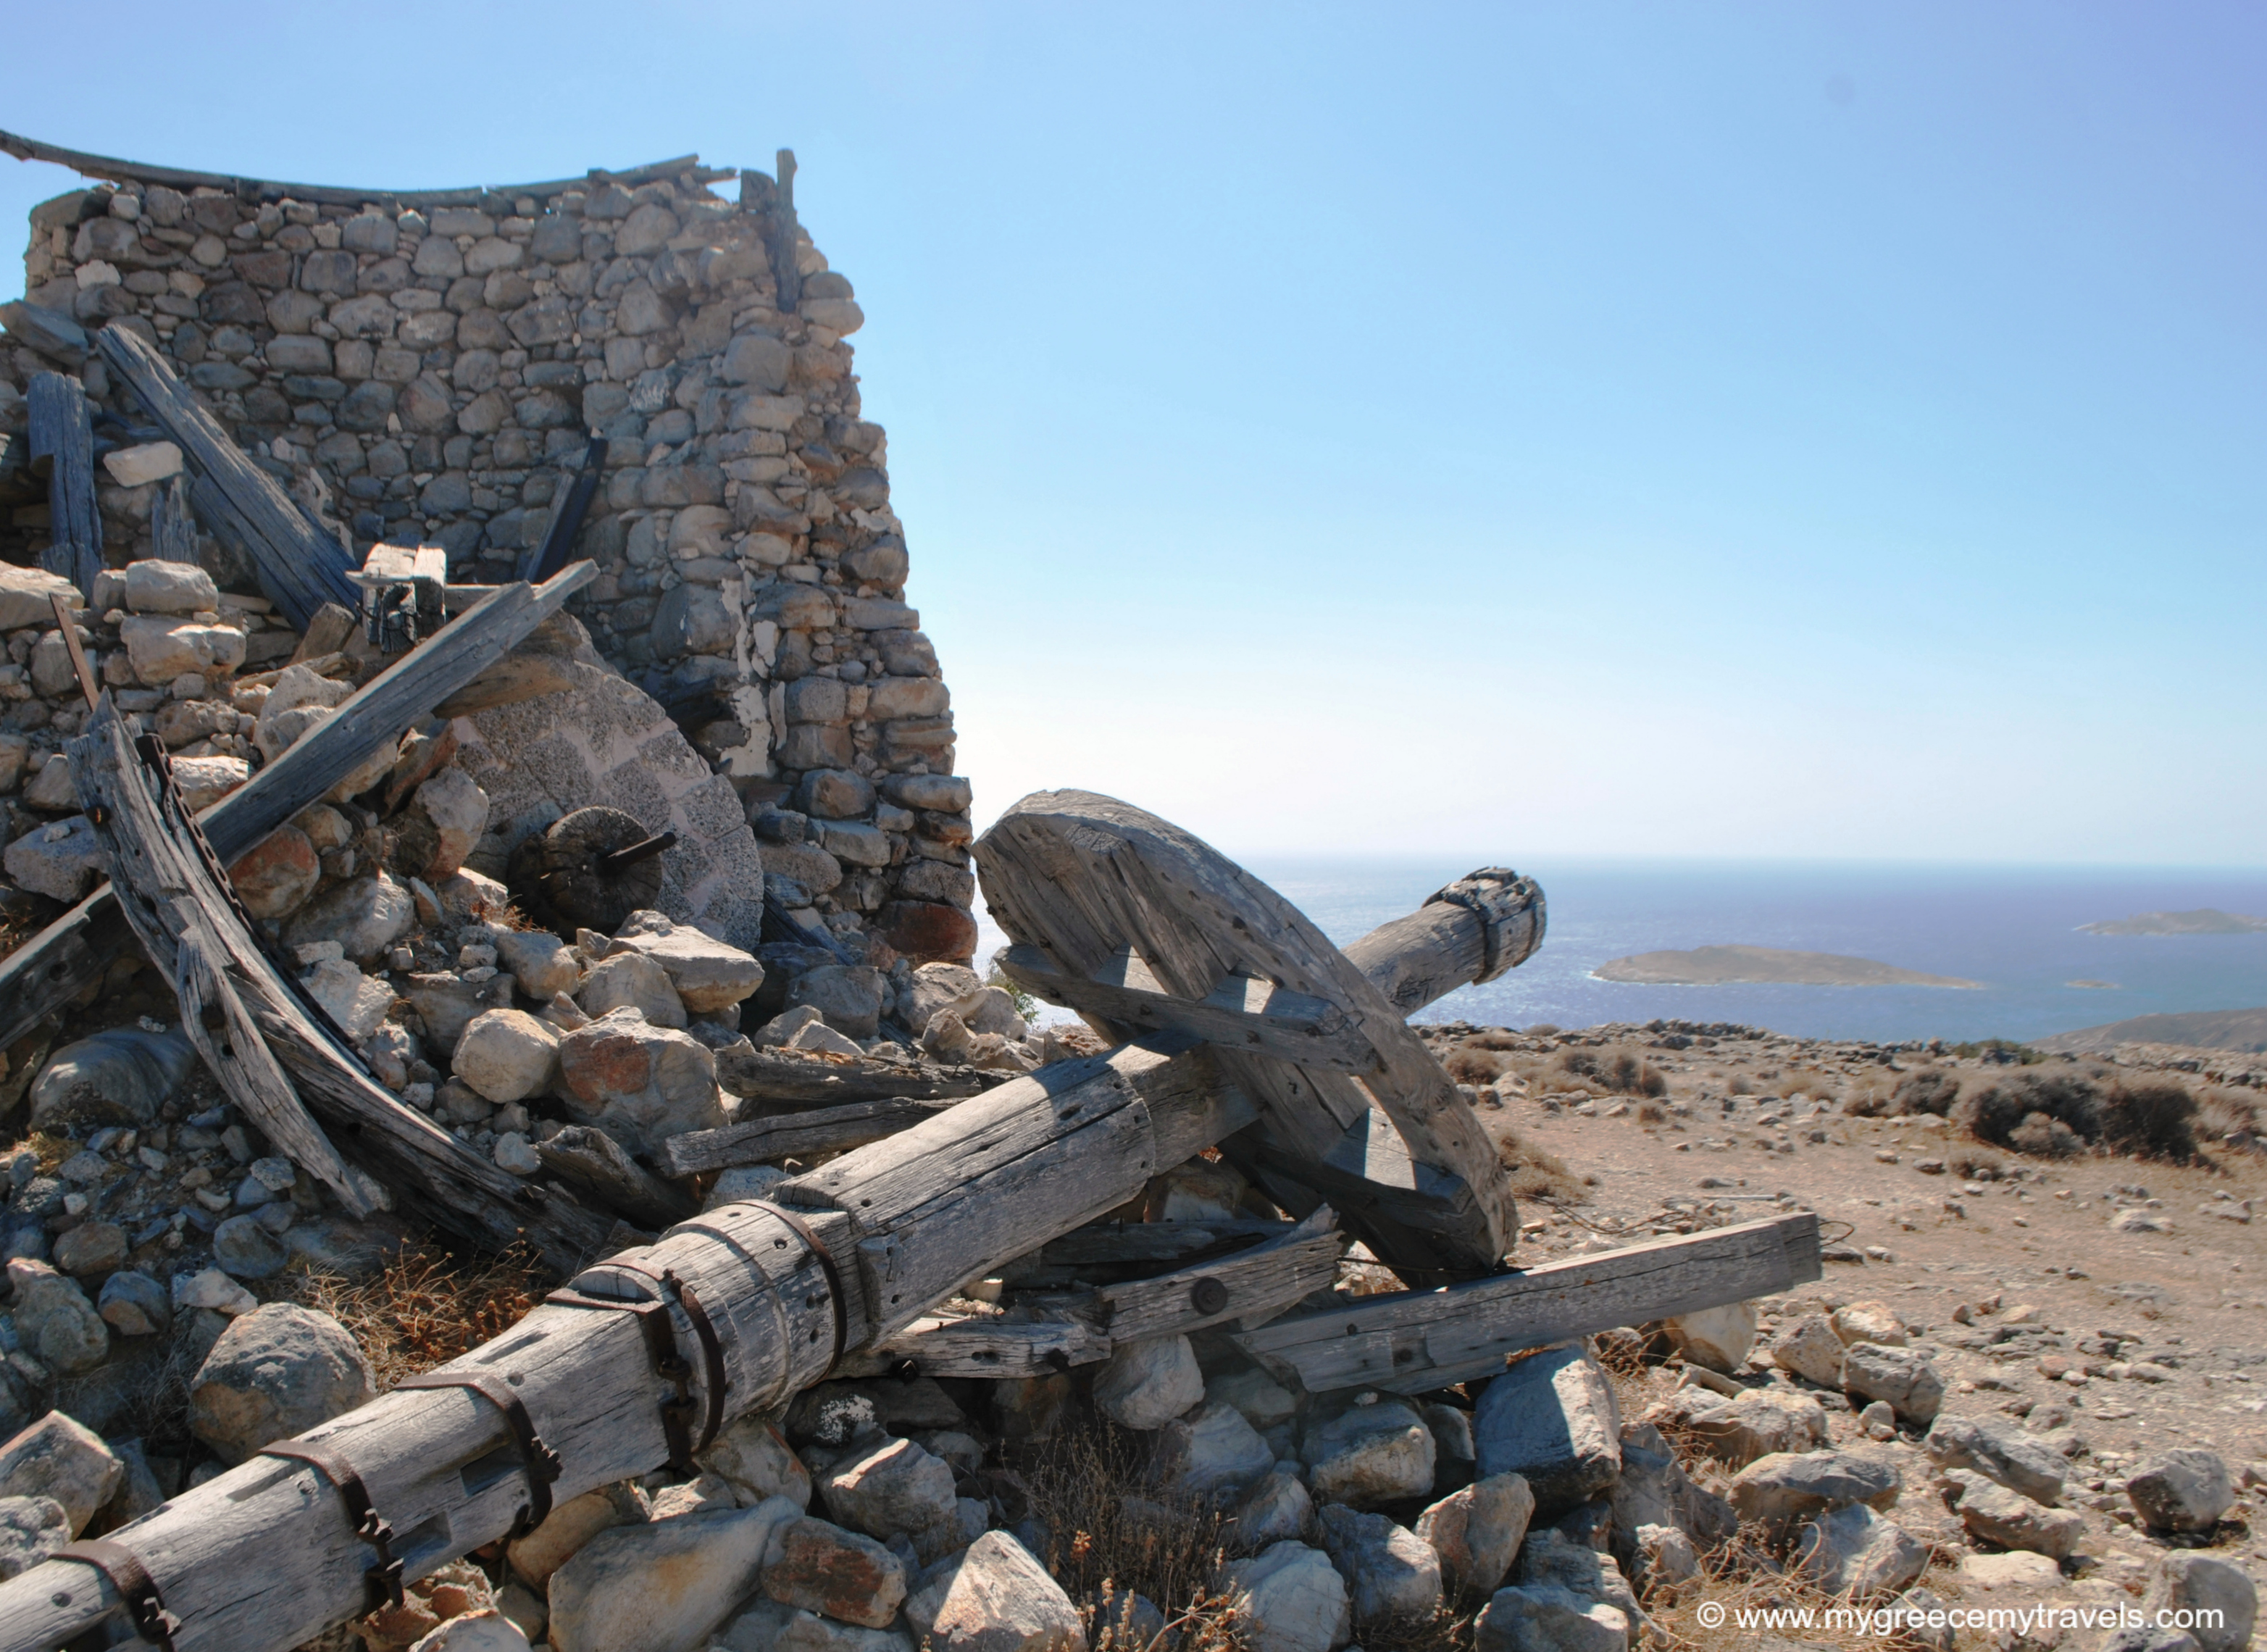 The Abandoned Windmills of Kimolos